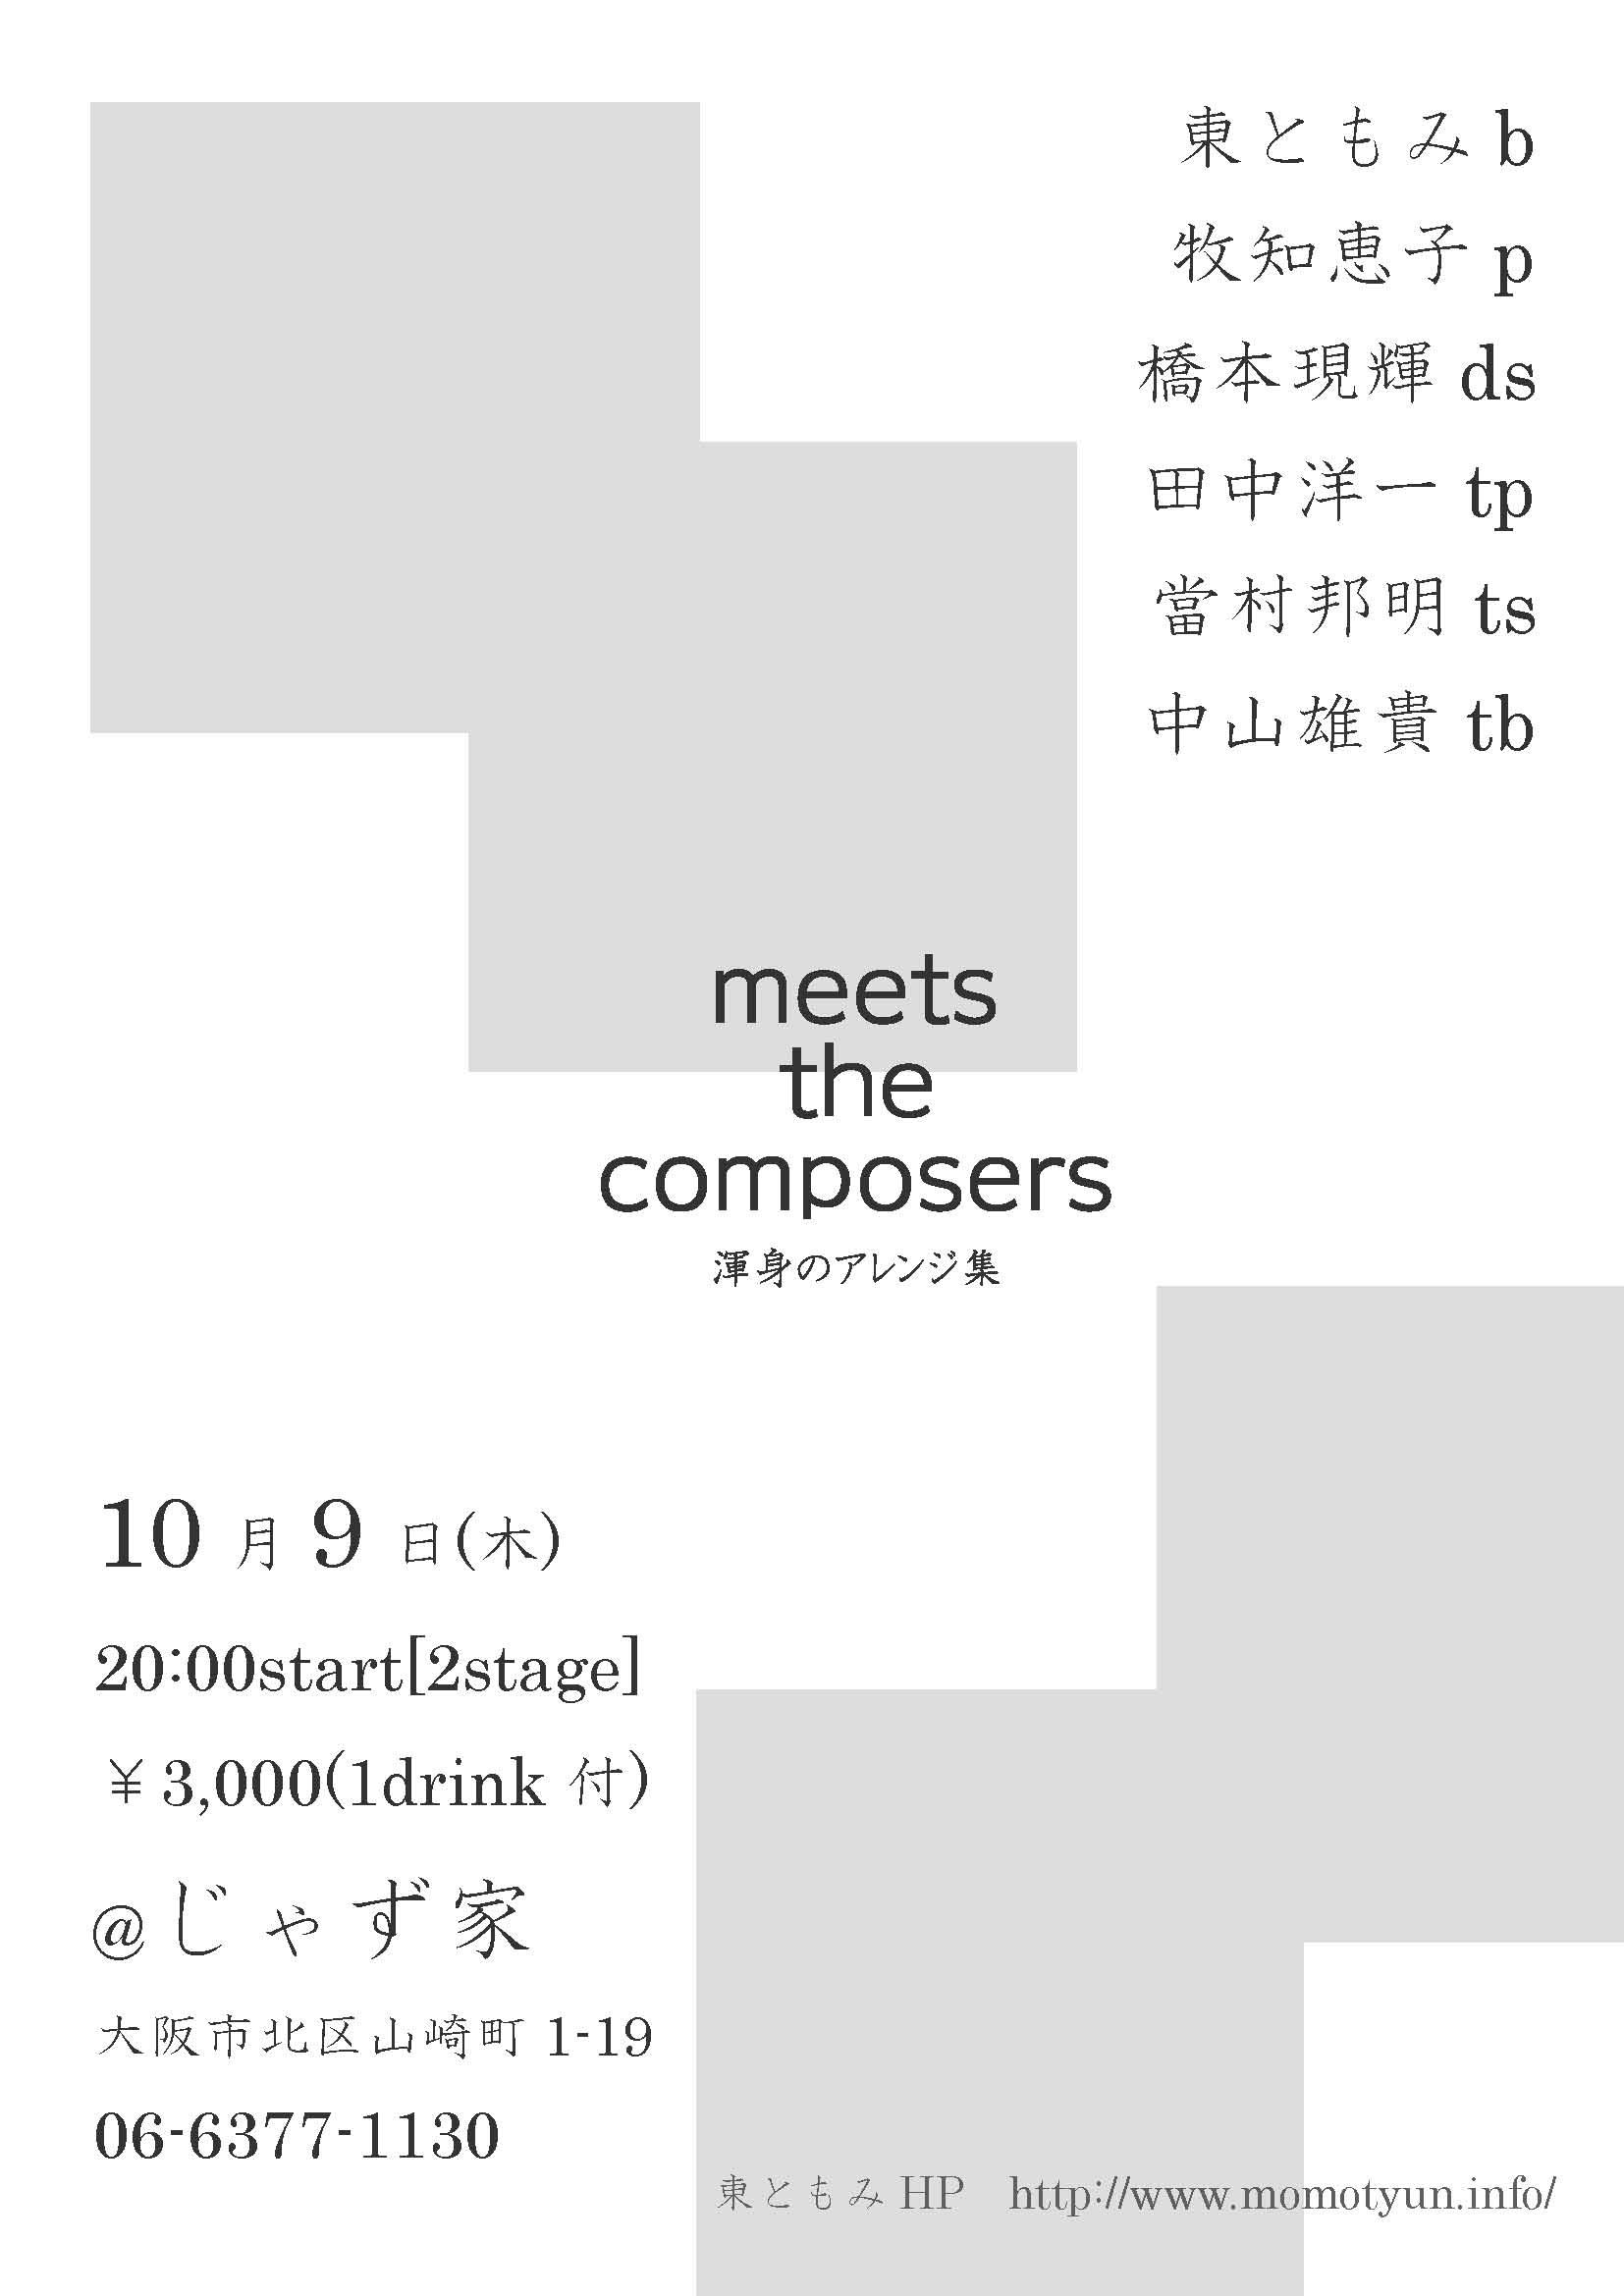 meets the composers プチレコ発♪のお知らせ。_f0042307_1459134.jpg